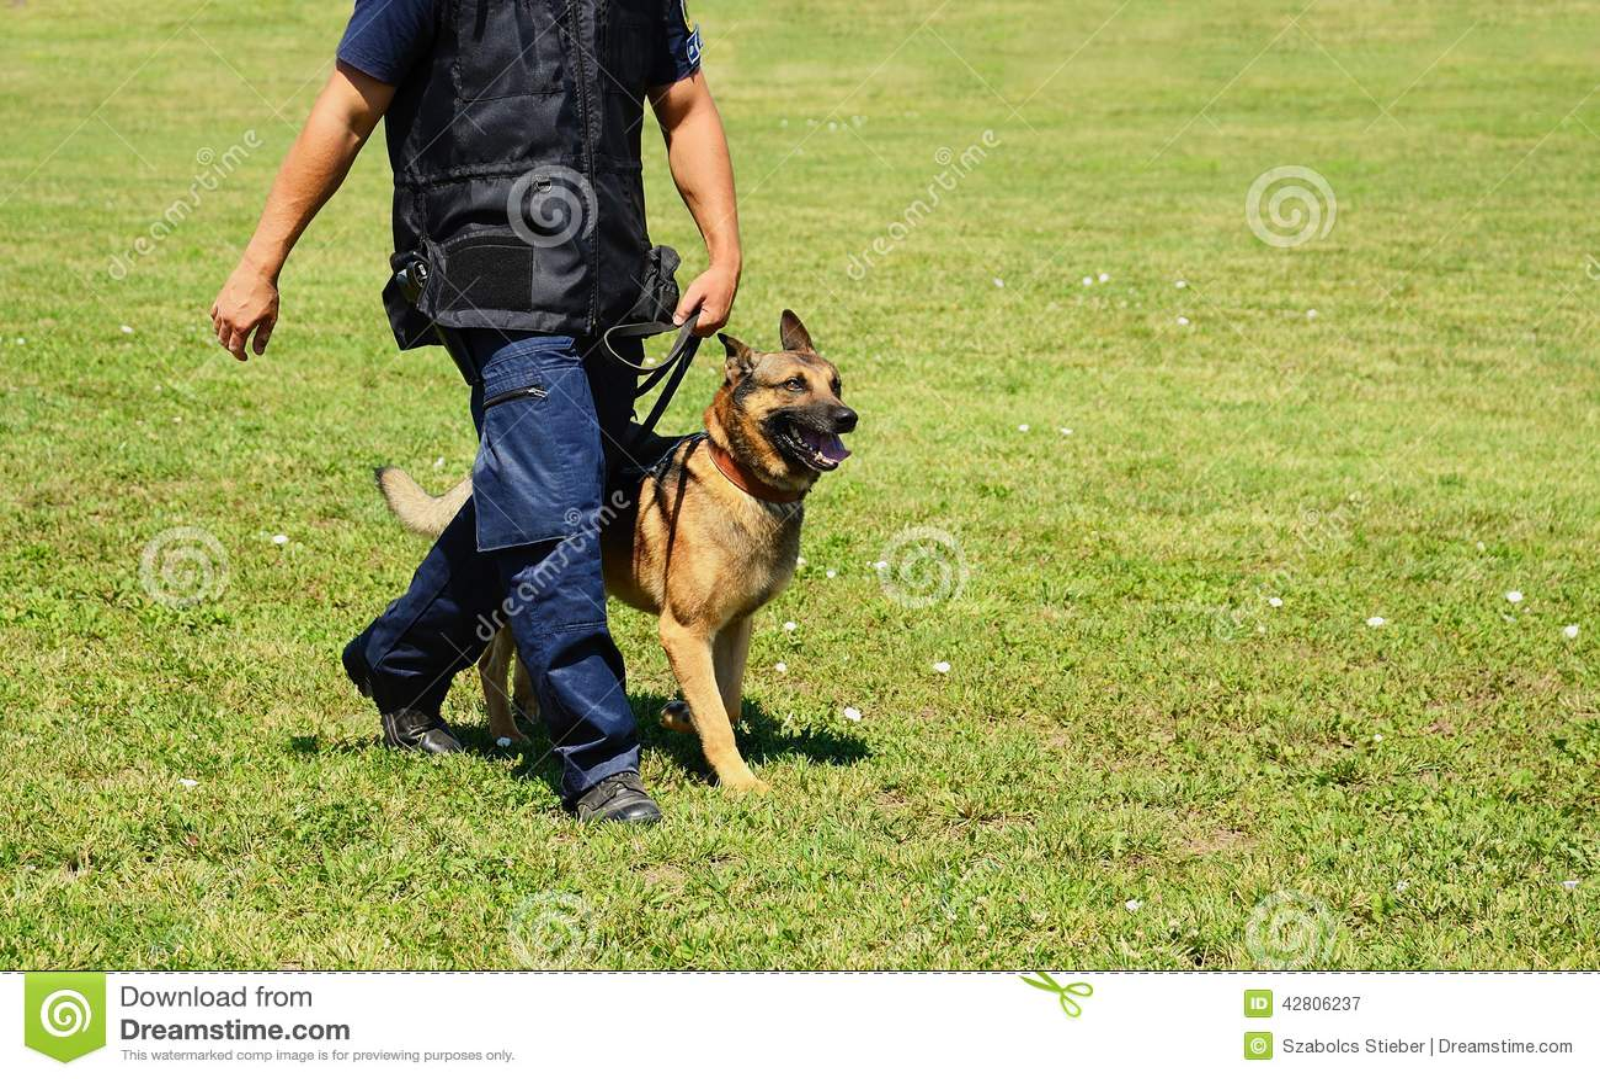 German Shepherd Police Dog Training Video Download